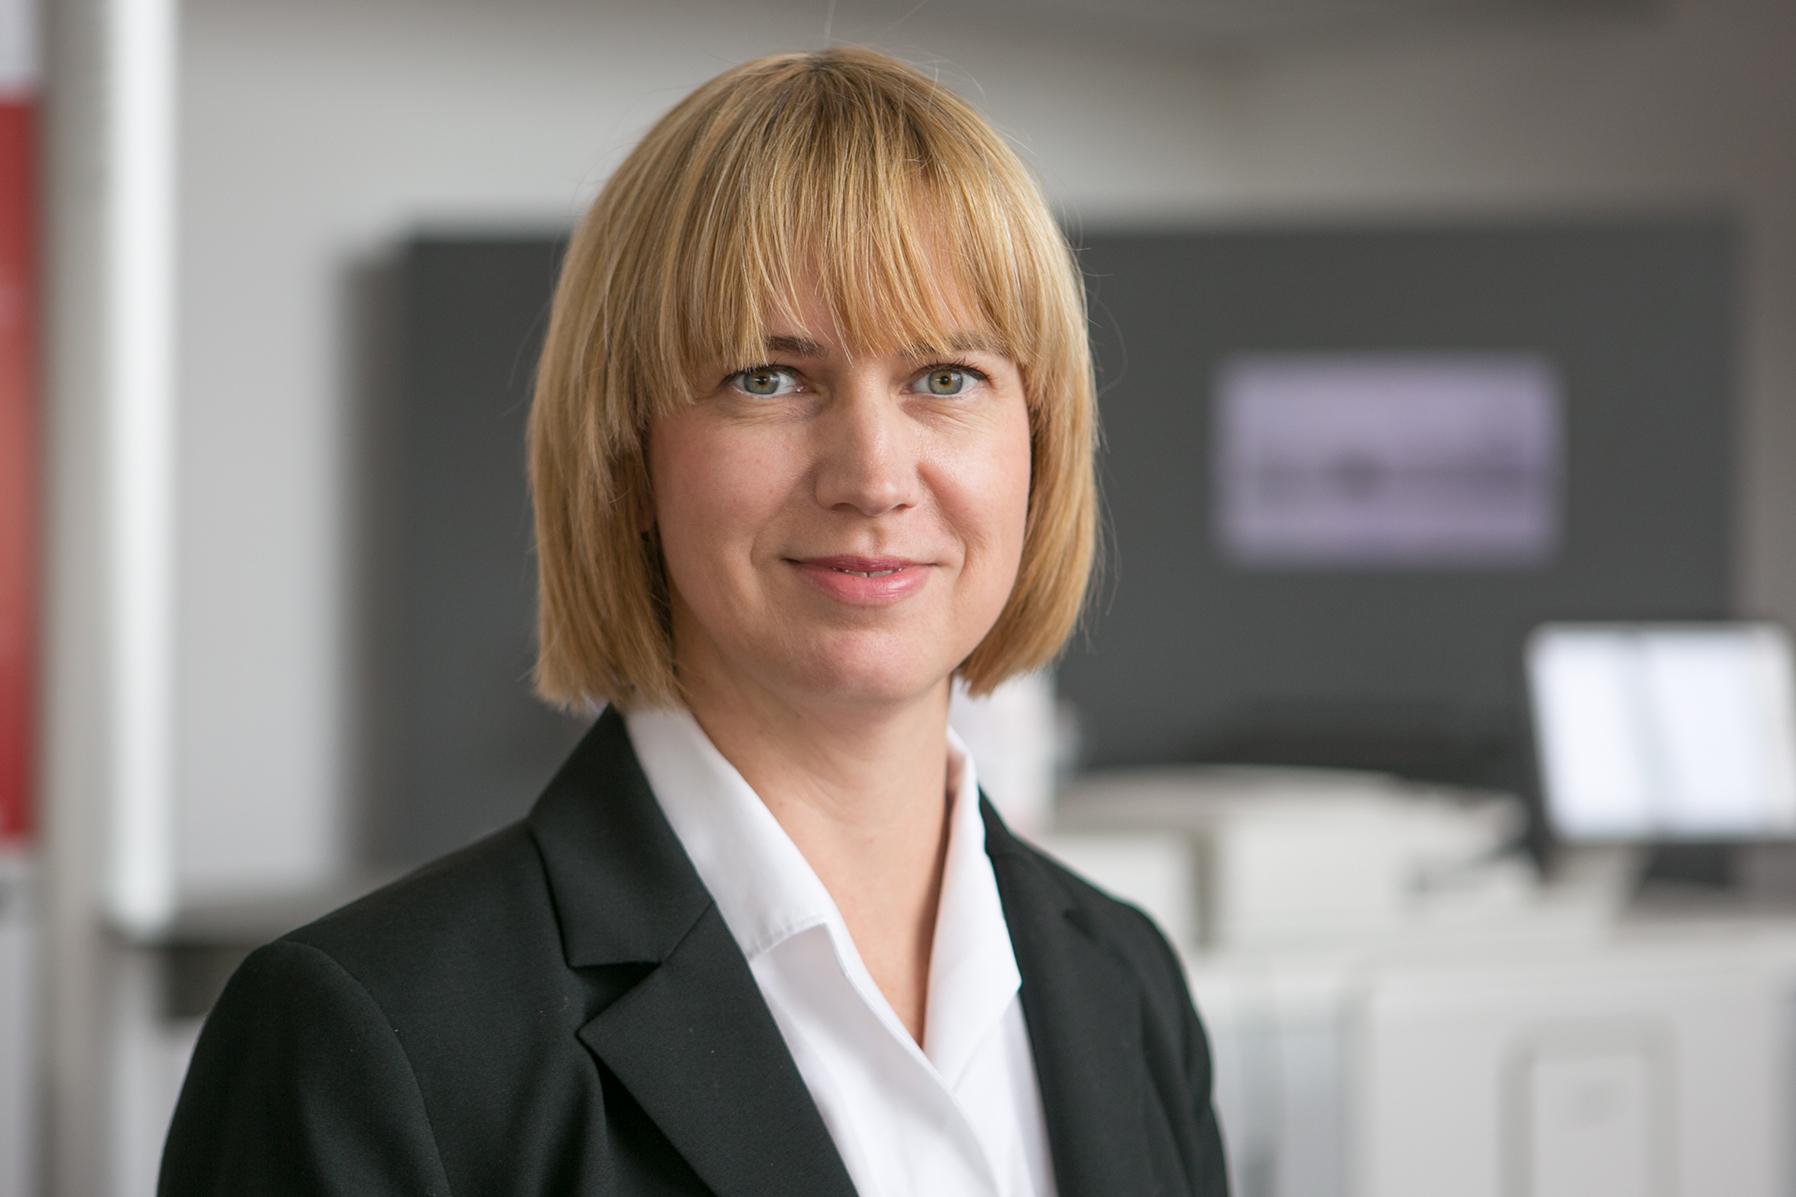 Sandra Greulich